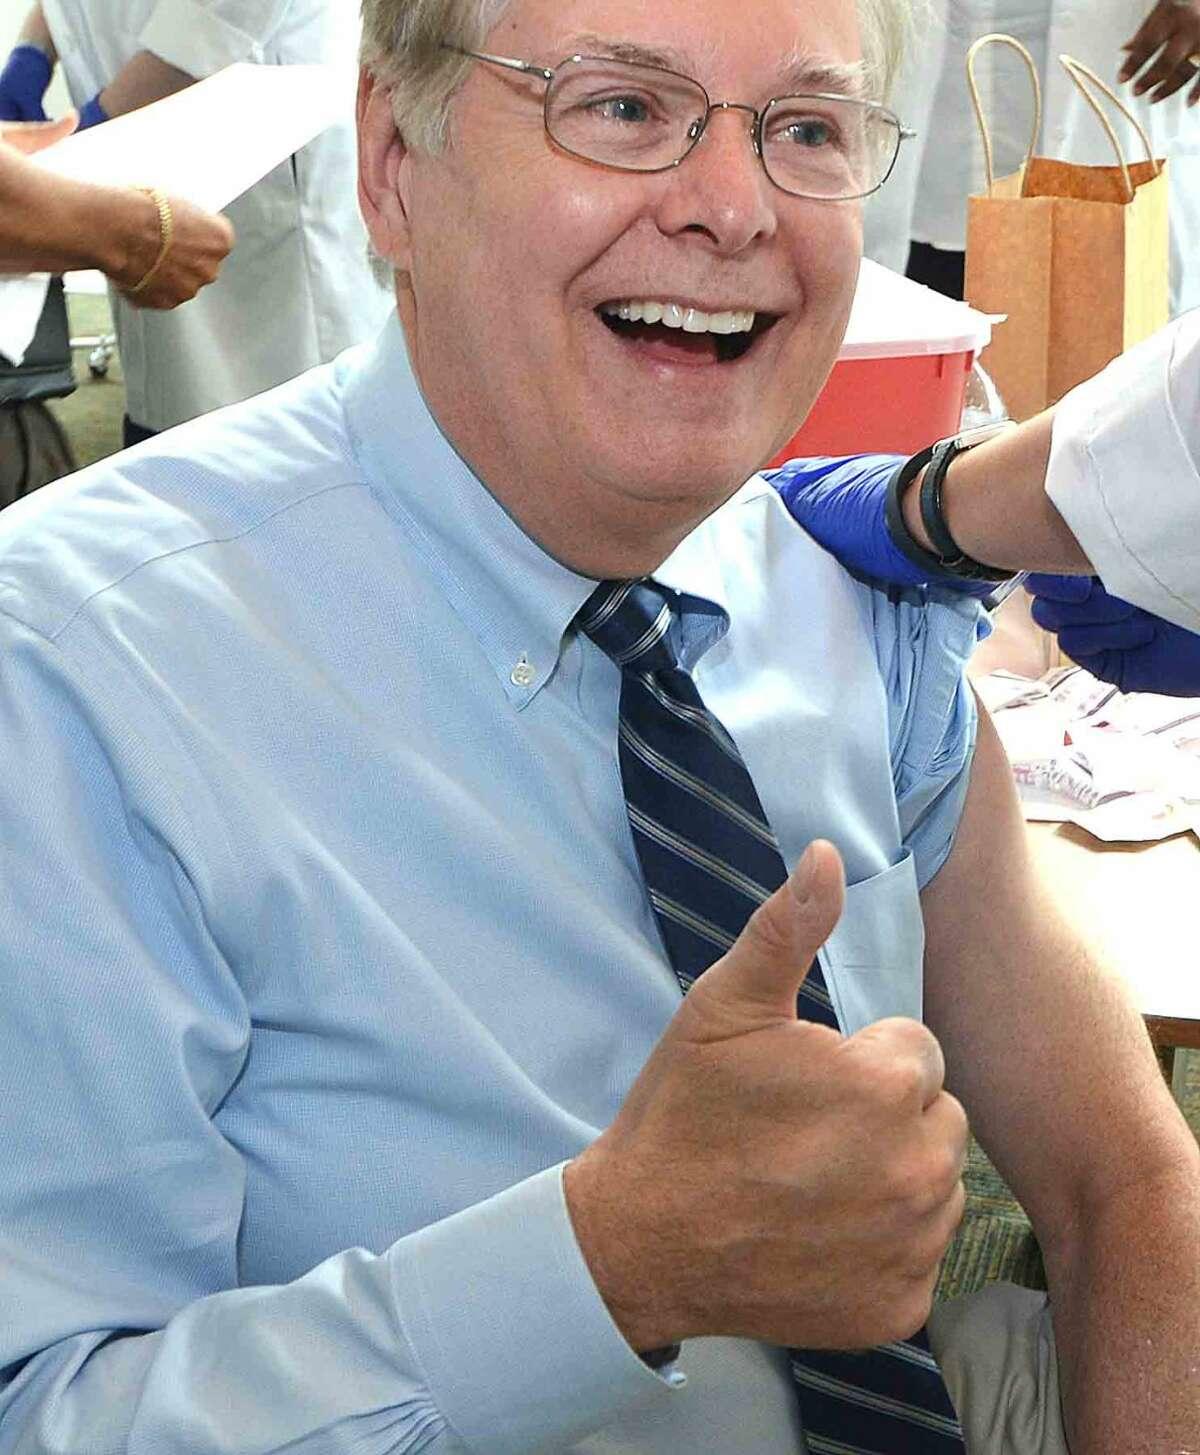 Mayor David Martin gets his flu shot Tuesday morning at the Stamford Government Center.